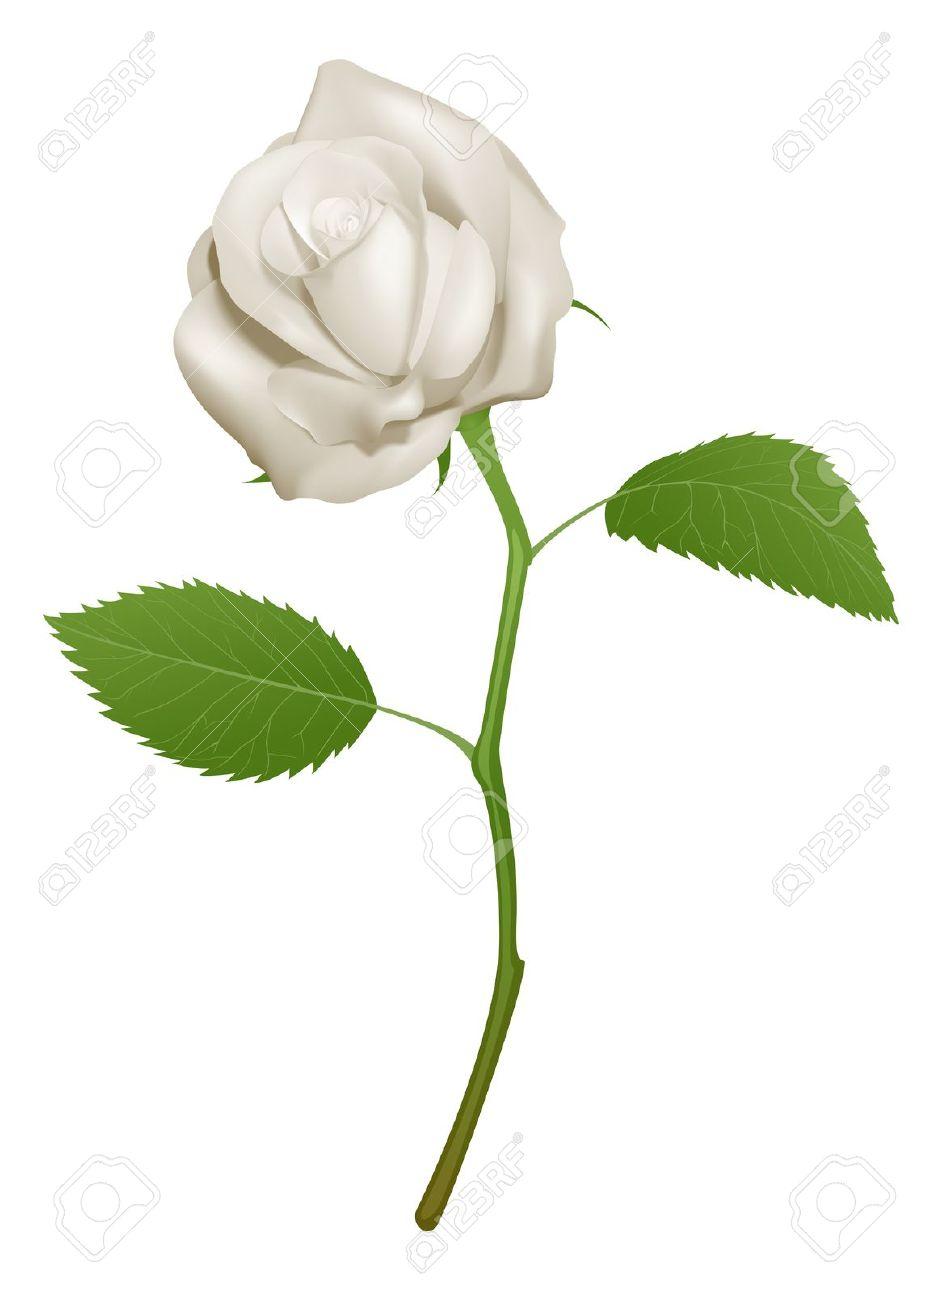 Un Esempio Di Una Bella Rosa Bianca Clipart Royalty.